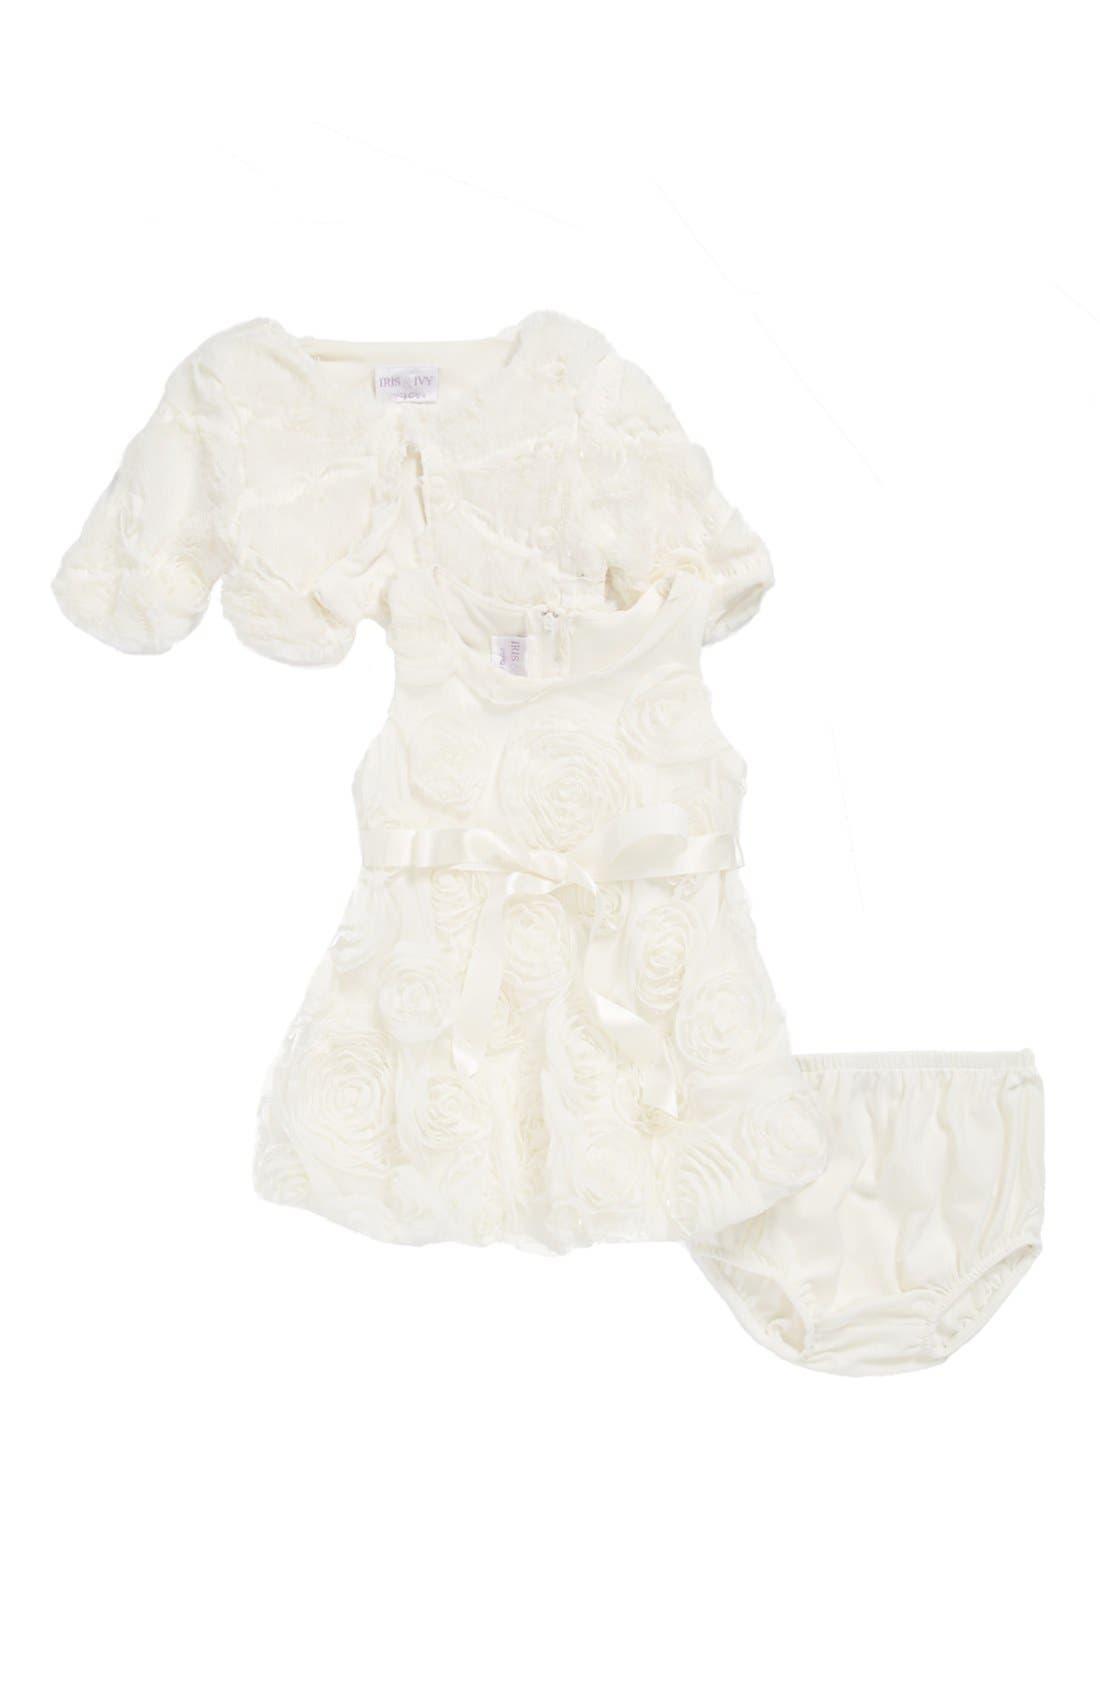 Main Image - Iris & Ivy Rosette Dress, Faux Fur Bolero & Bloomers (Baby Girls)